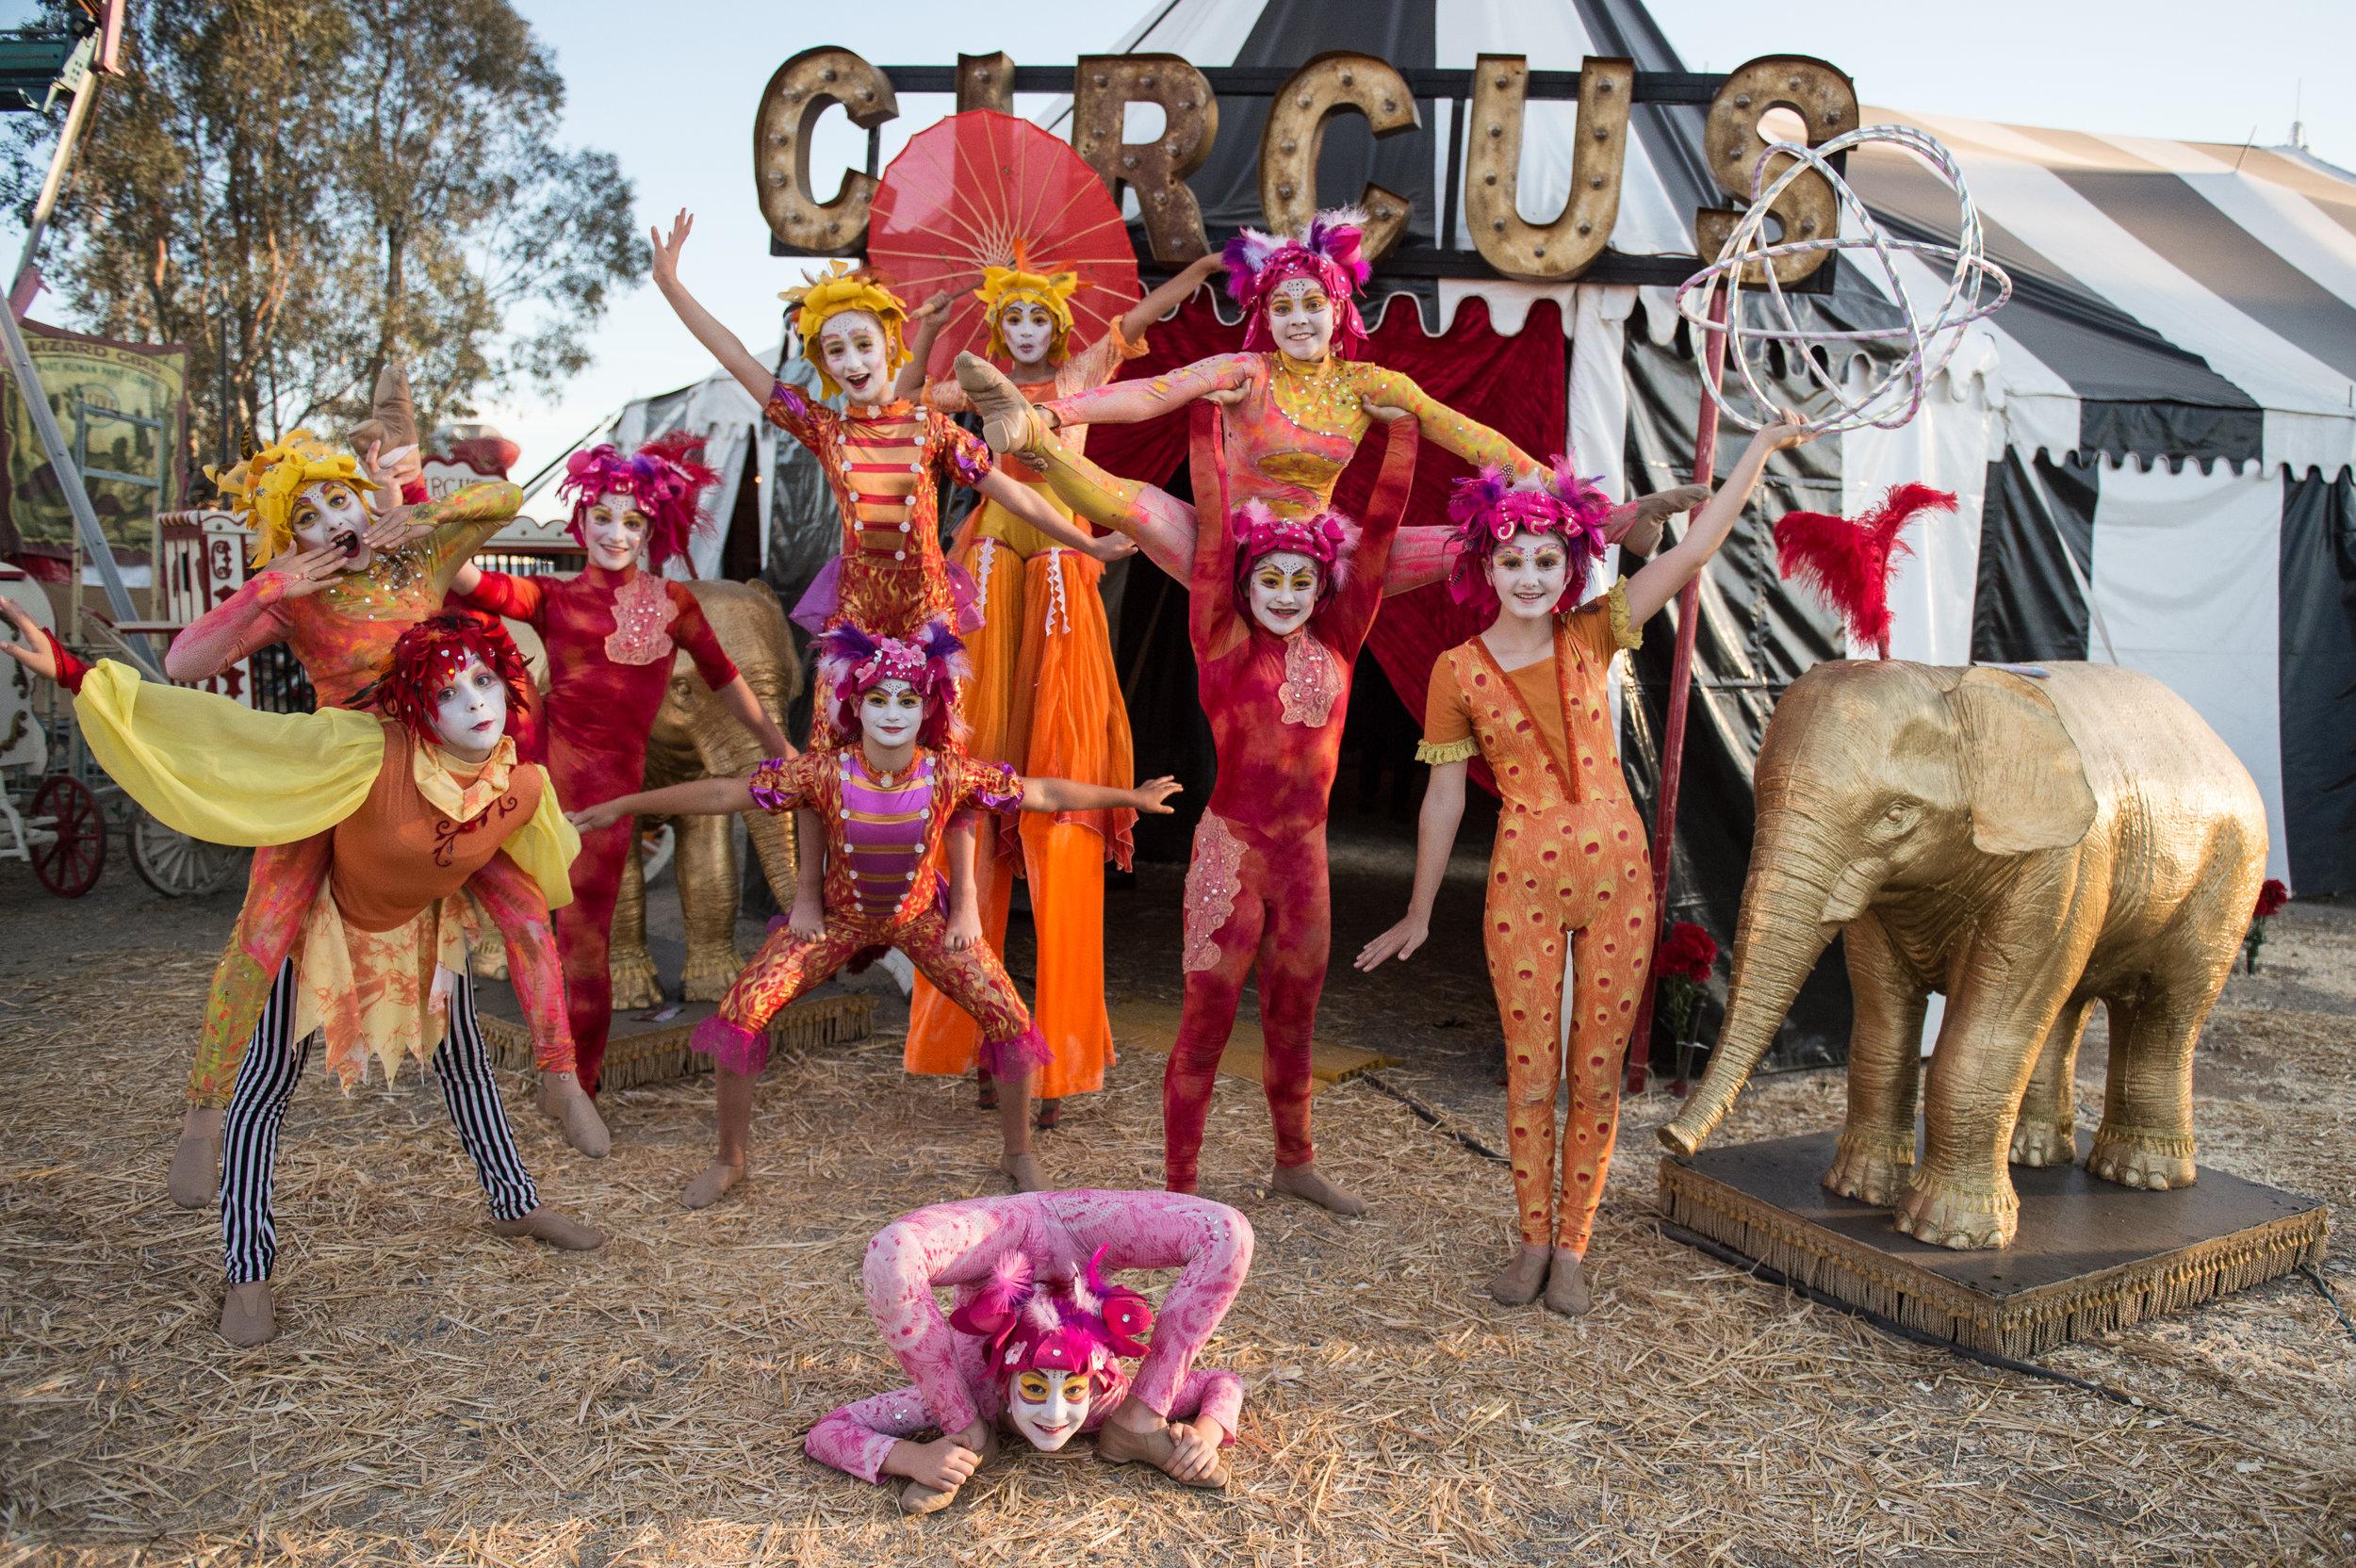 2016_Jun_2016-6-LPC_LA_Circus_Party2_720.jpg